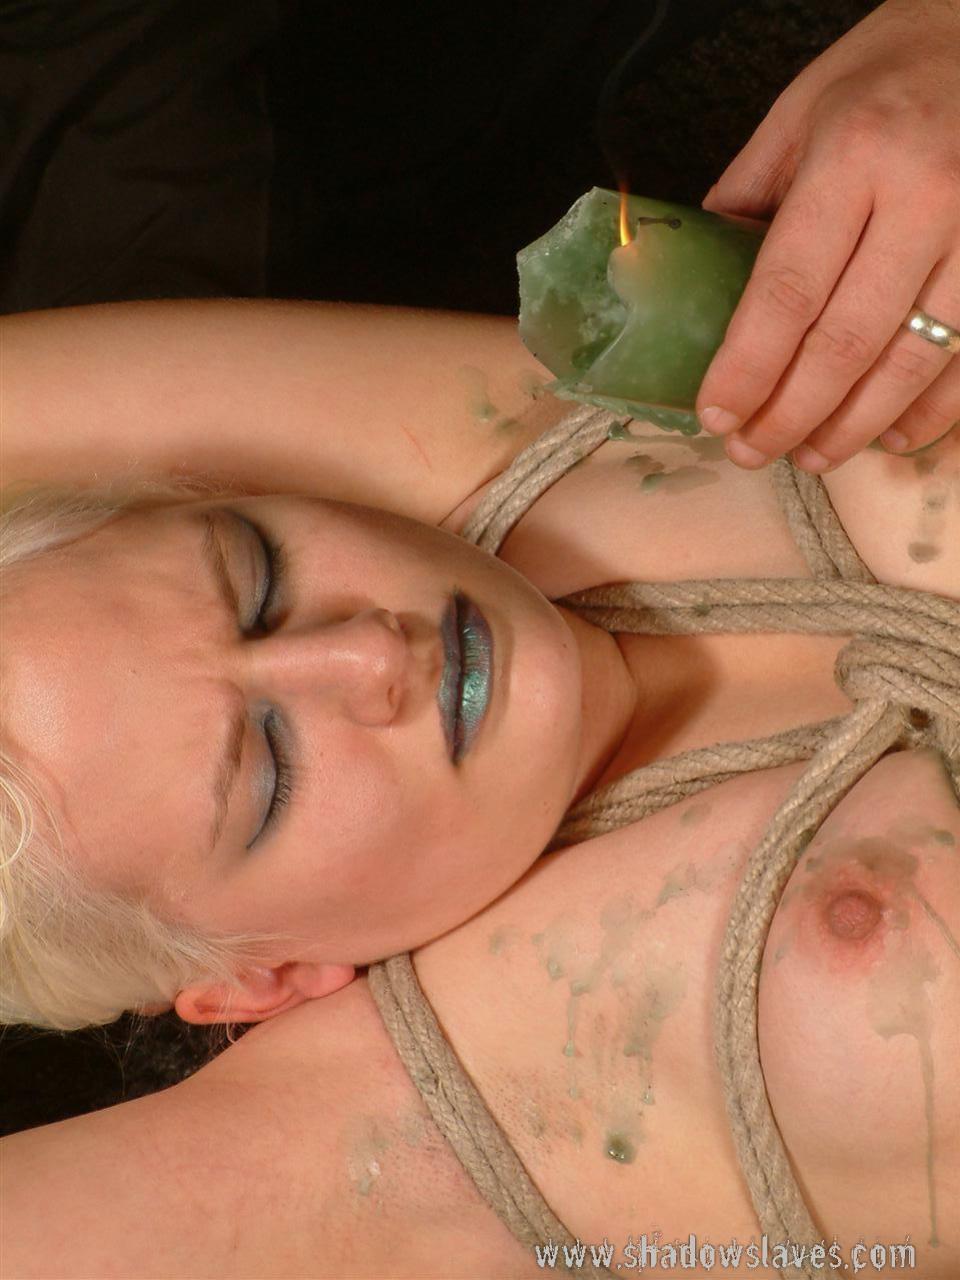 Hot Wax Bondage Porn Videos Pornhubcom